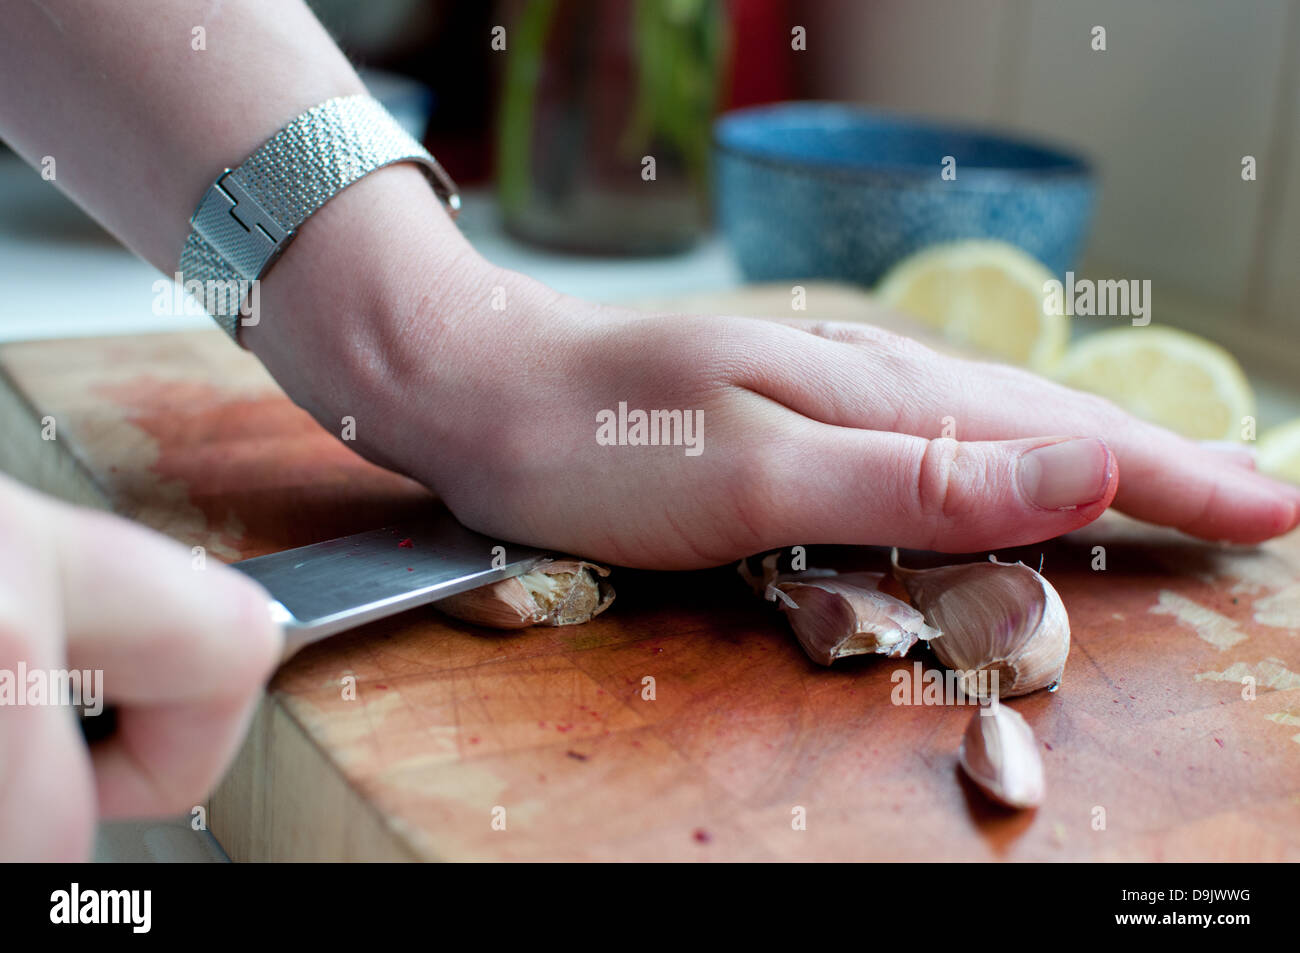 squashing garlic - Stock Image